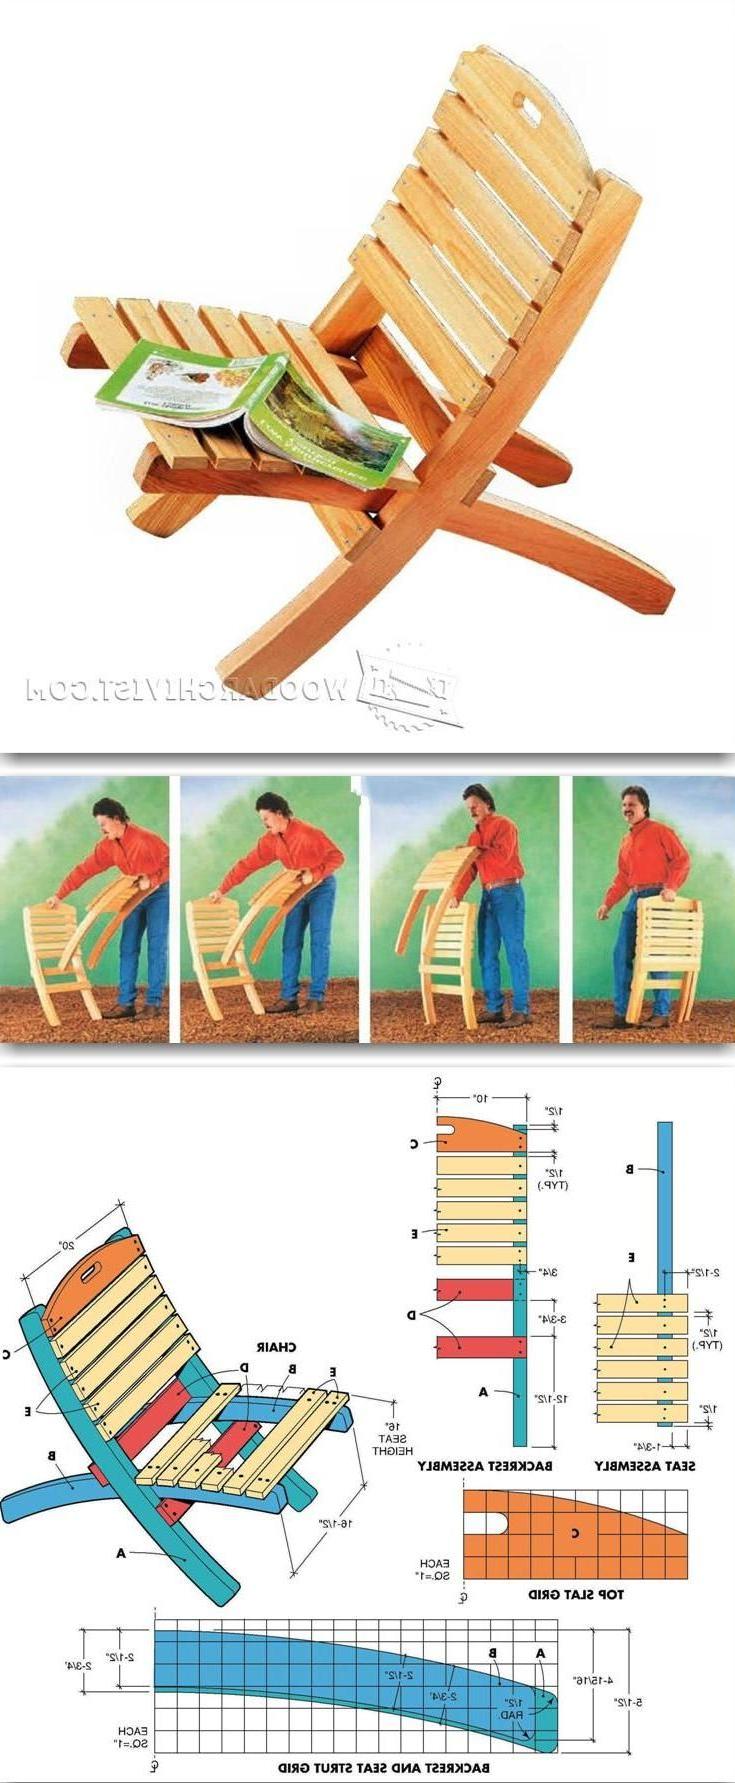 Amazonia Copacabana Wood Swing Chairs For Preferred Pinrobert On Press (View 17 of 25)